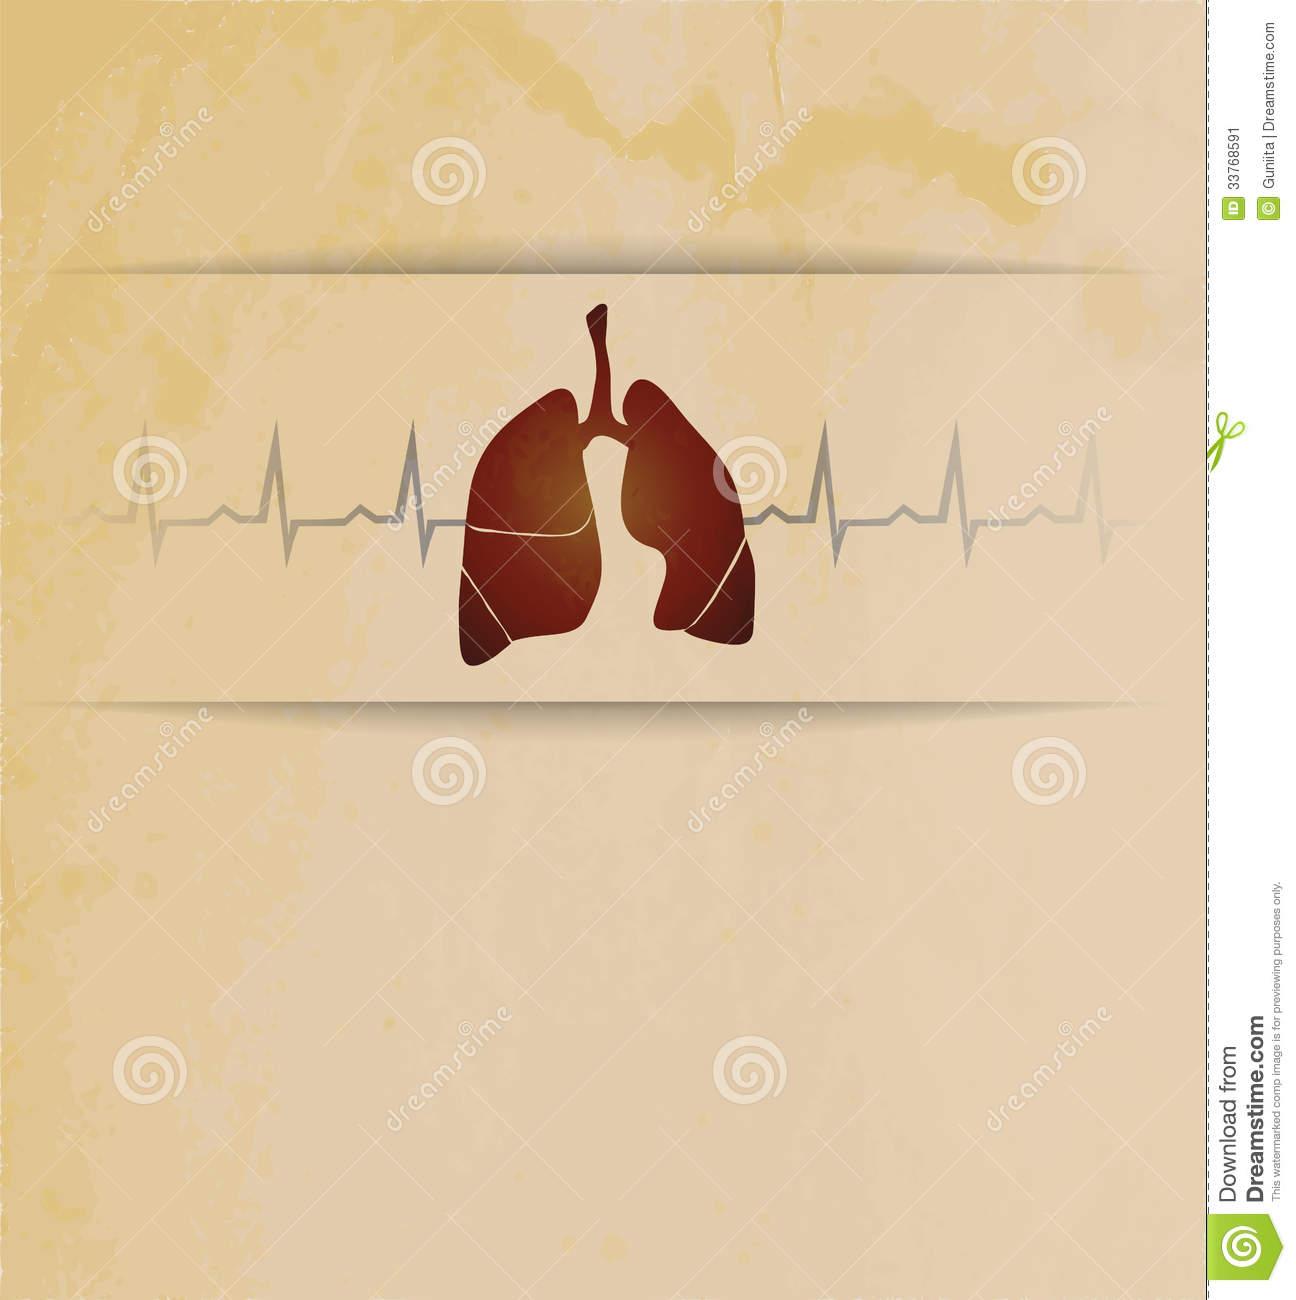 vintage lung design artistic medical wallpaper lungs heart beats 1296x1300